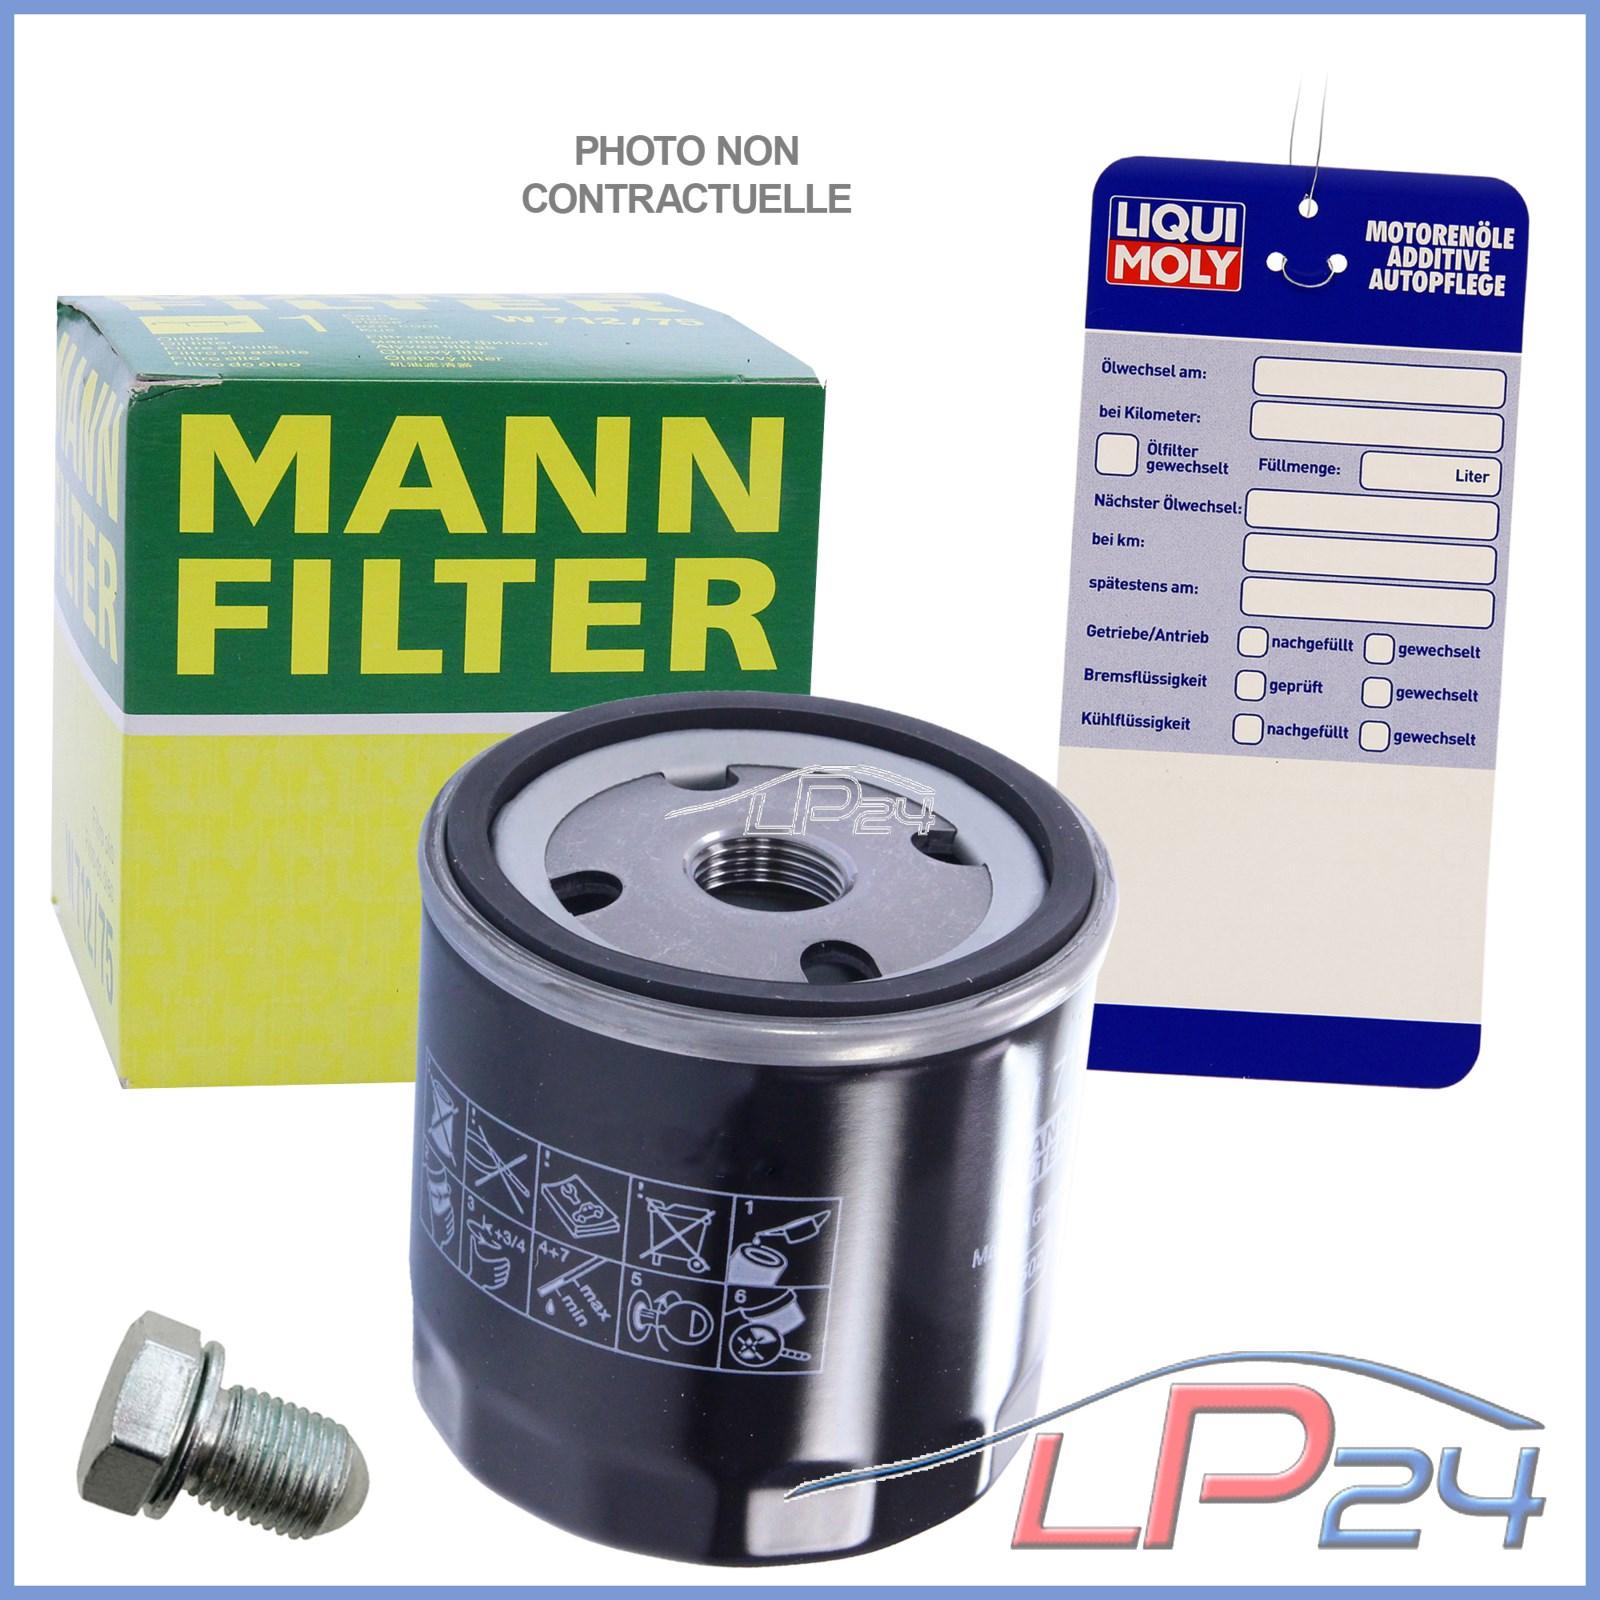 mann filter w714 4 filtre huile bouchon de vidange bague d 39 tanch it ebay. Black Bedroom Furniture Sets. Home Design Ideas